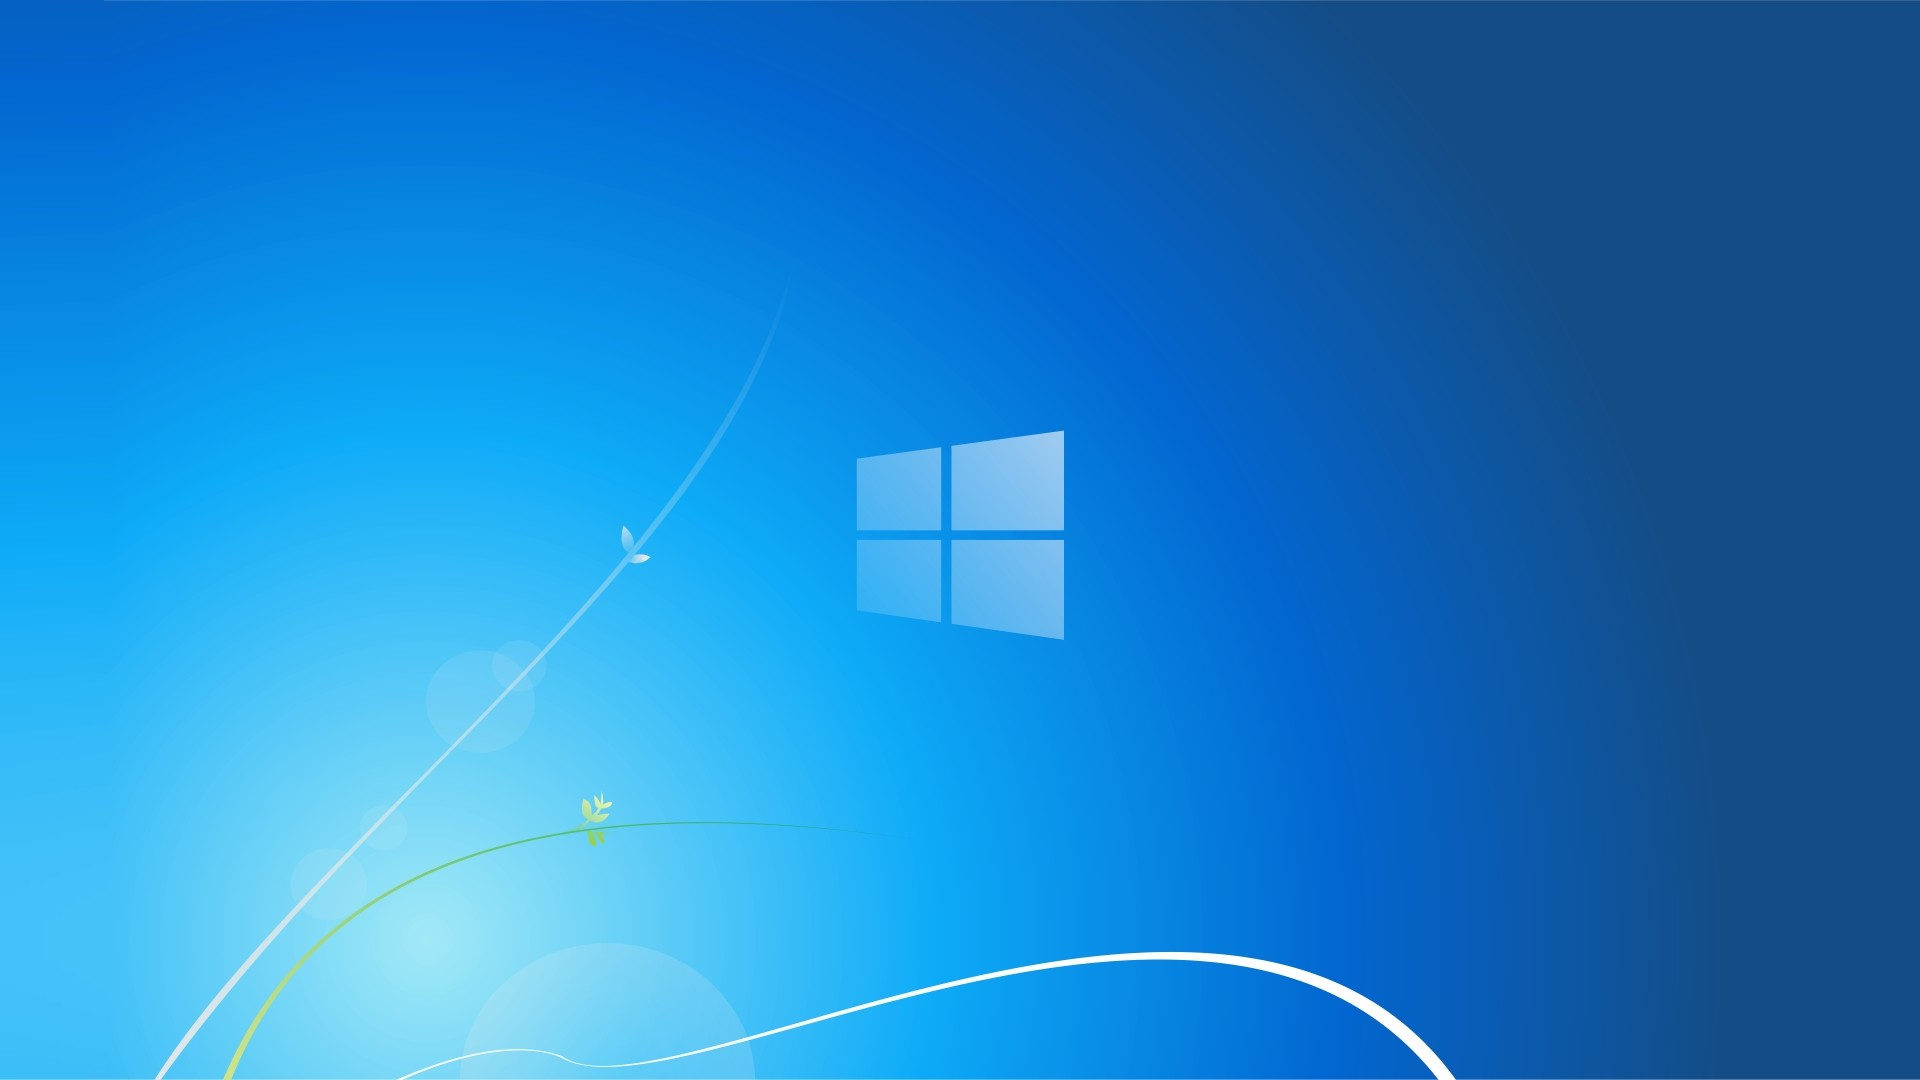 Desktop Background Windows 7 62 images 1920x1080